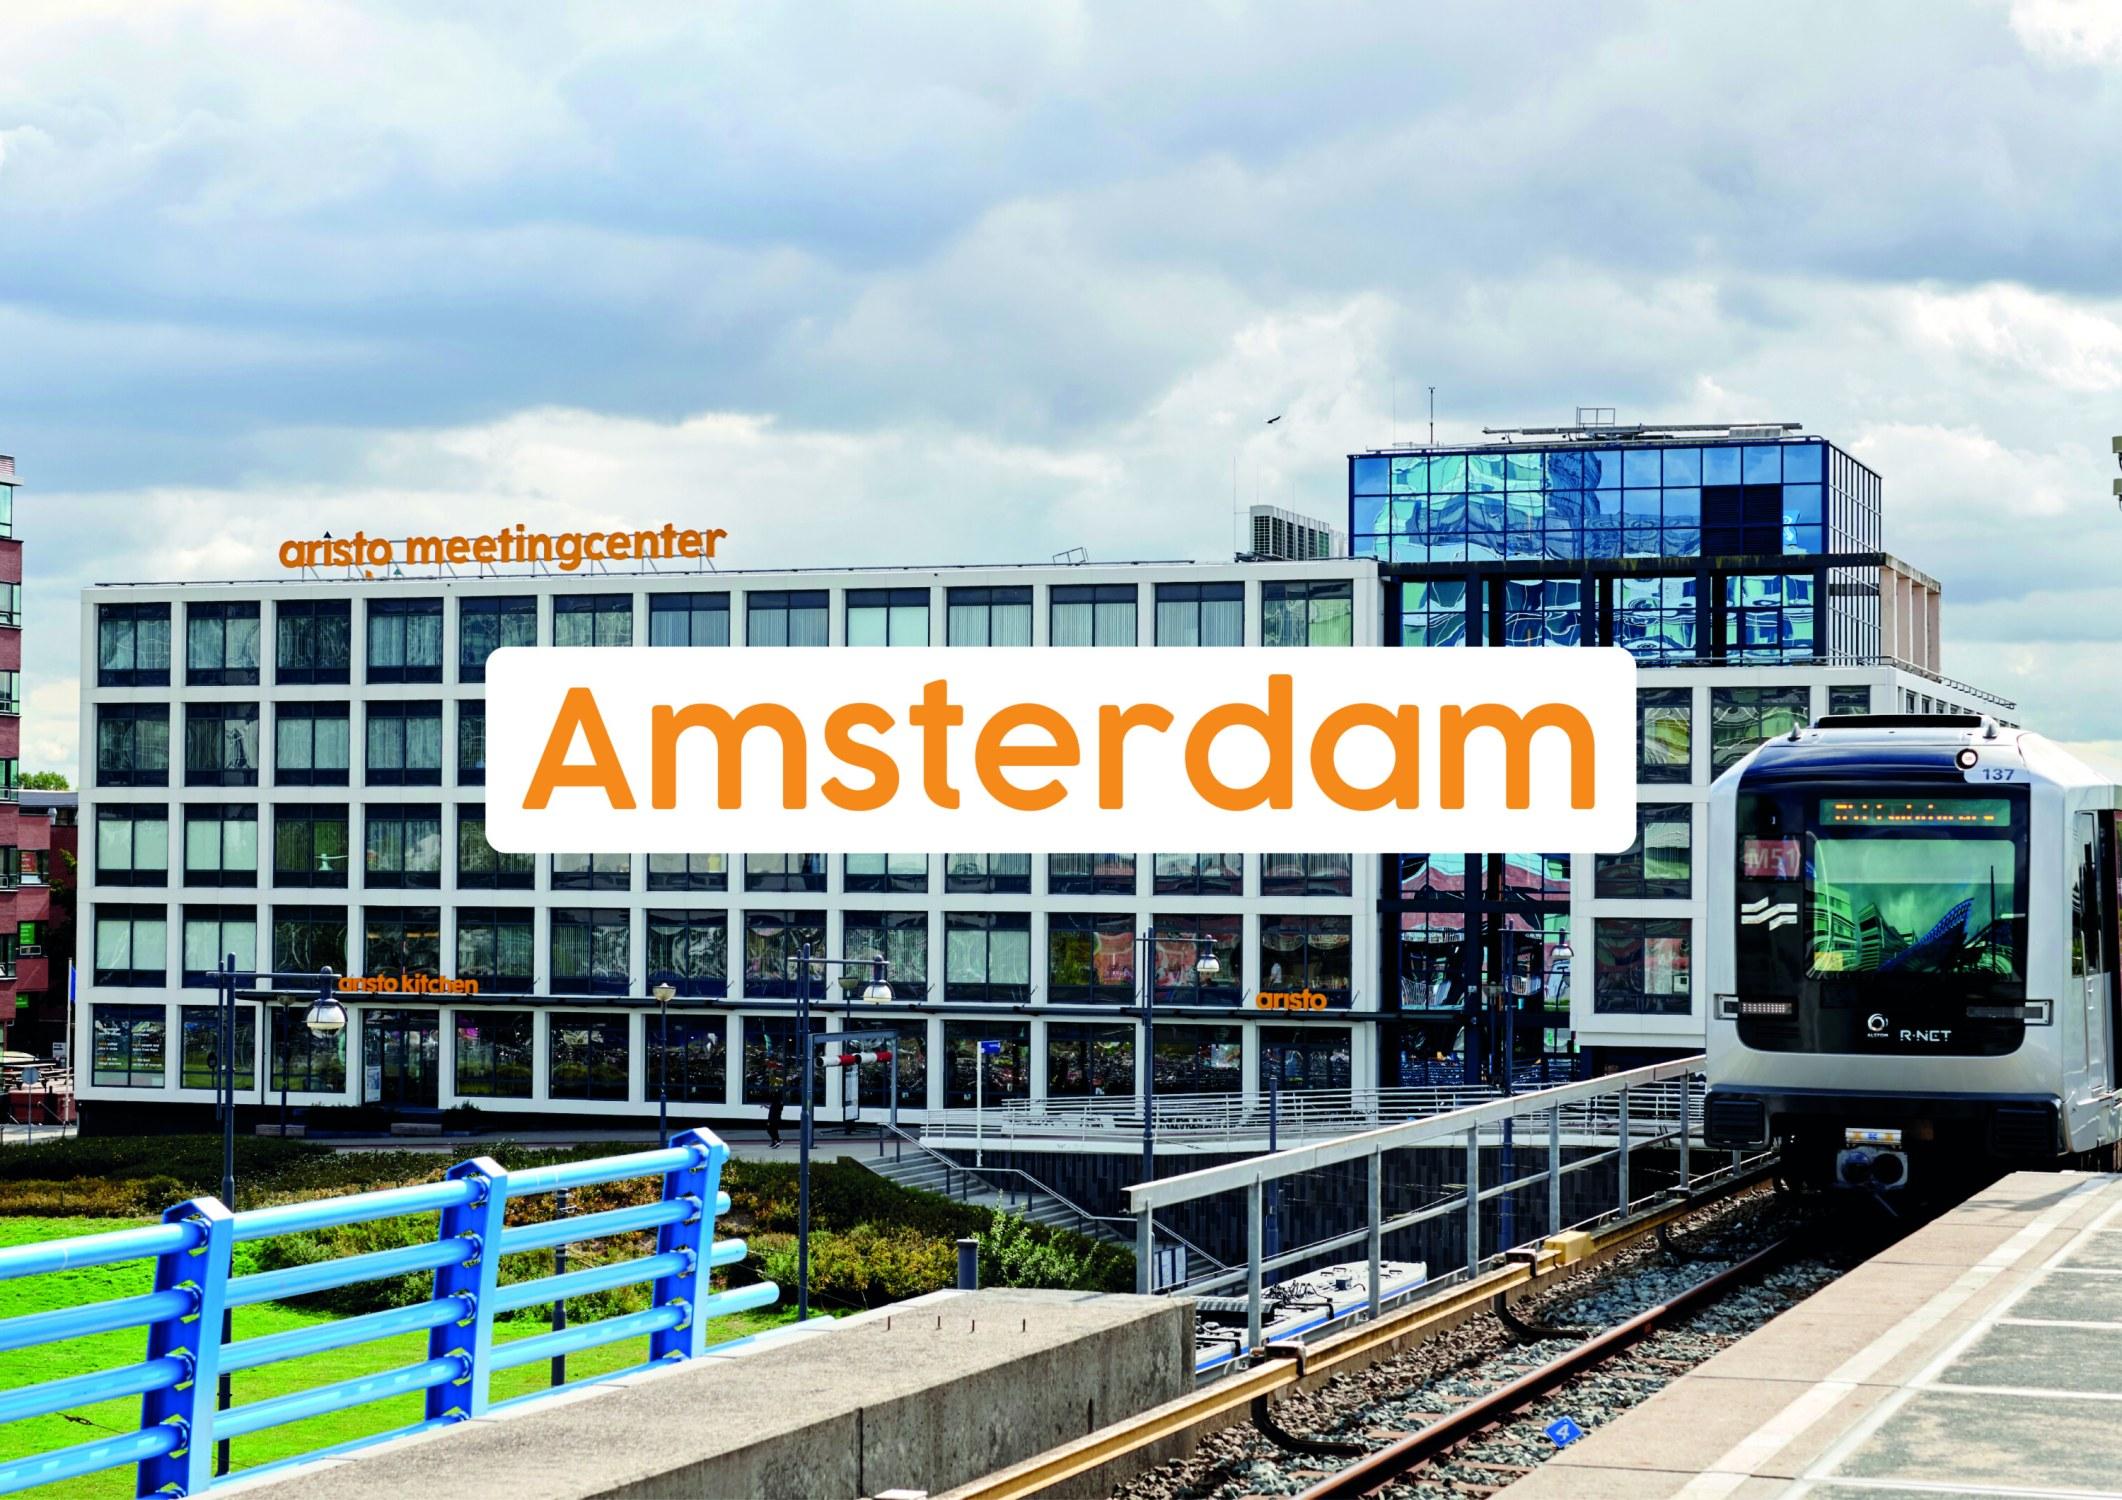 Aristo Amsterdam